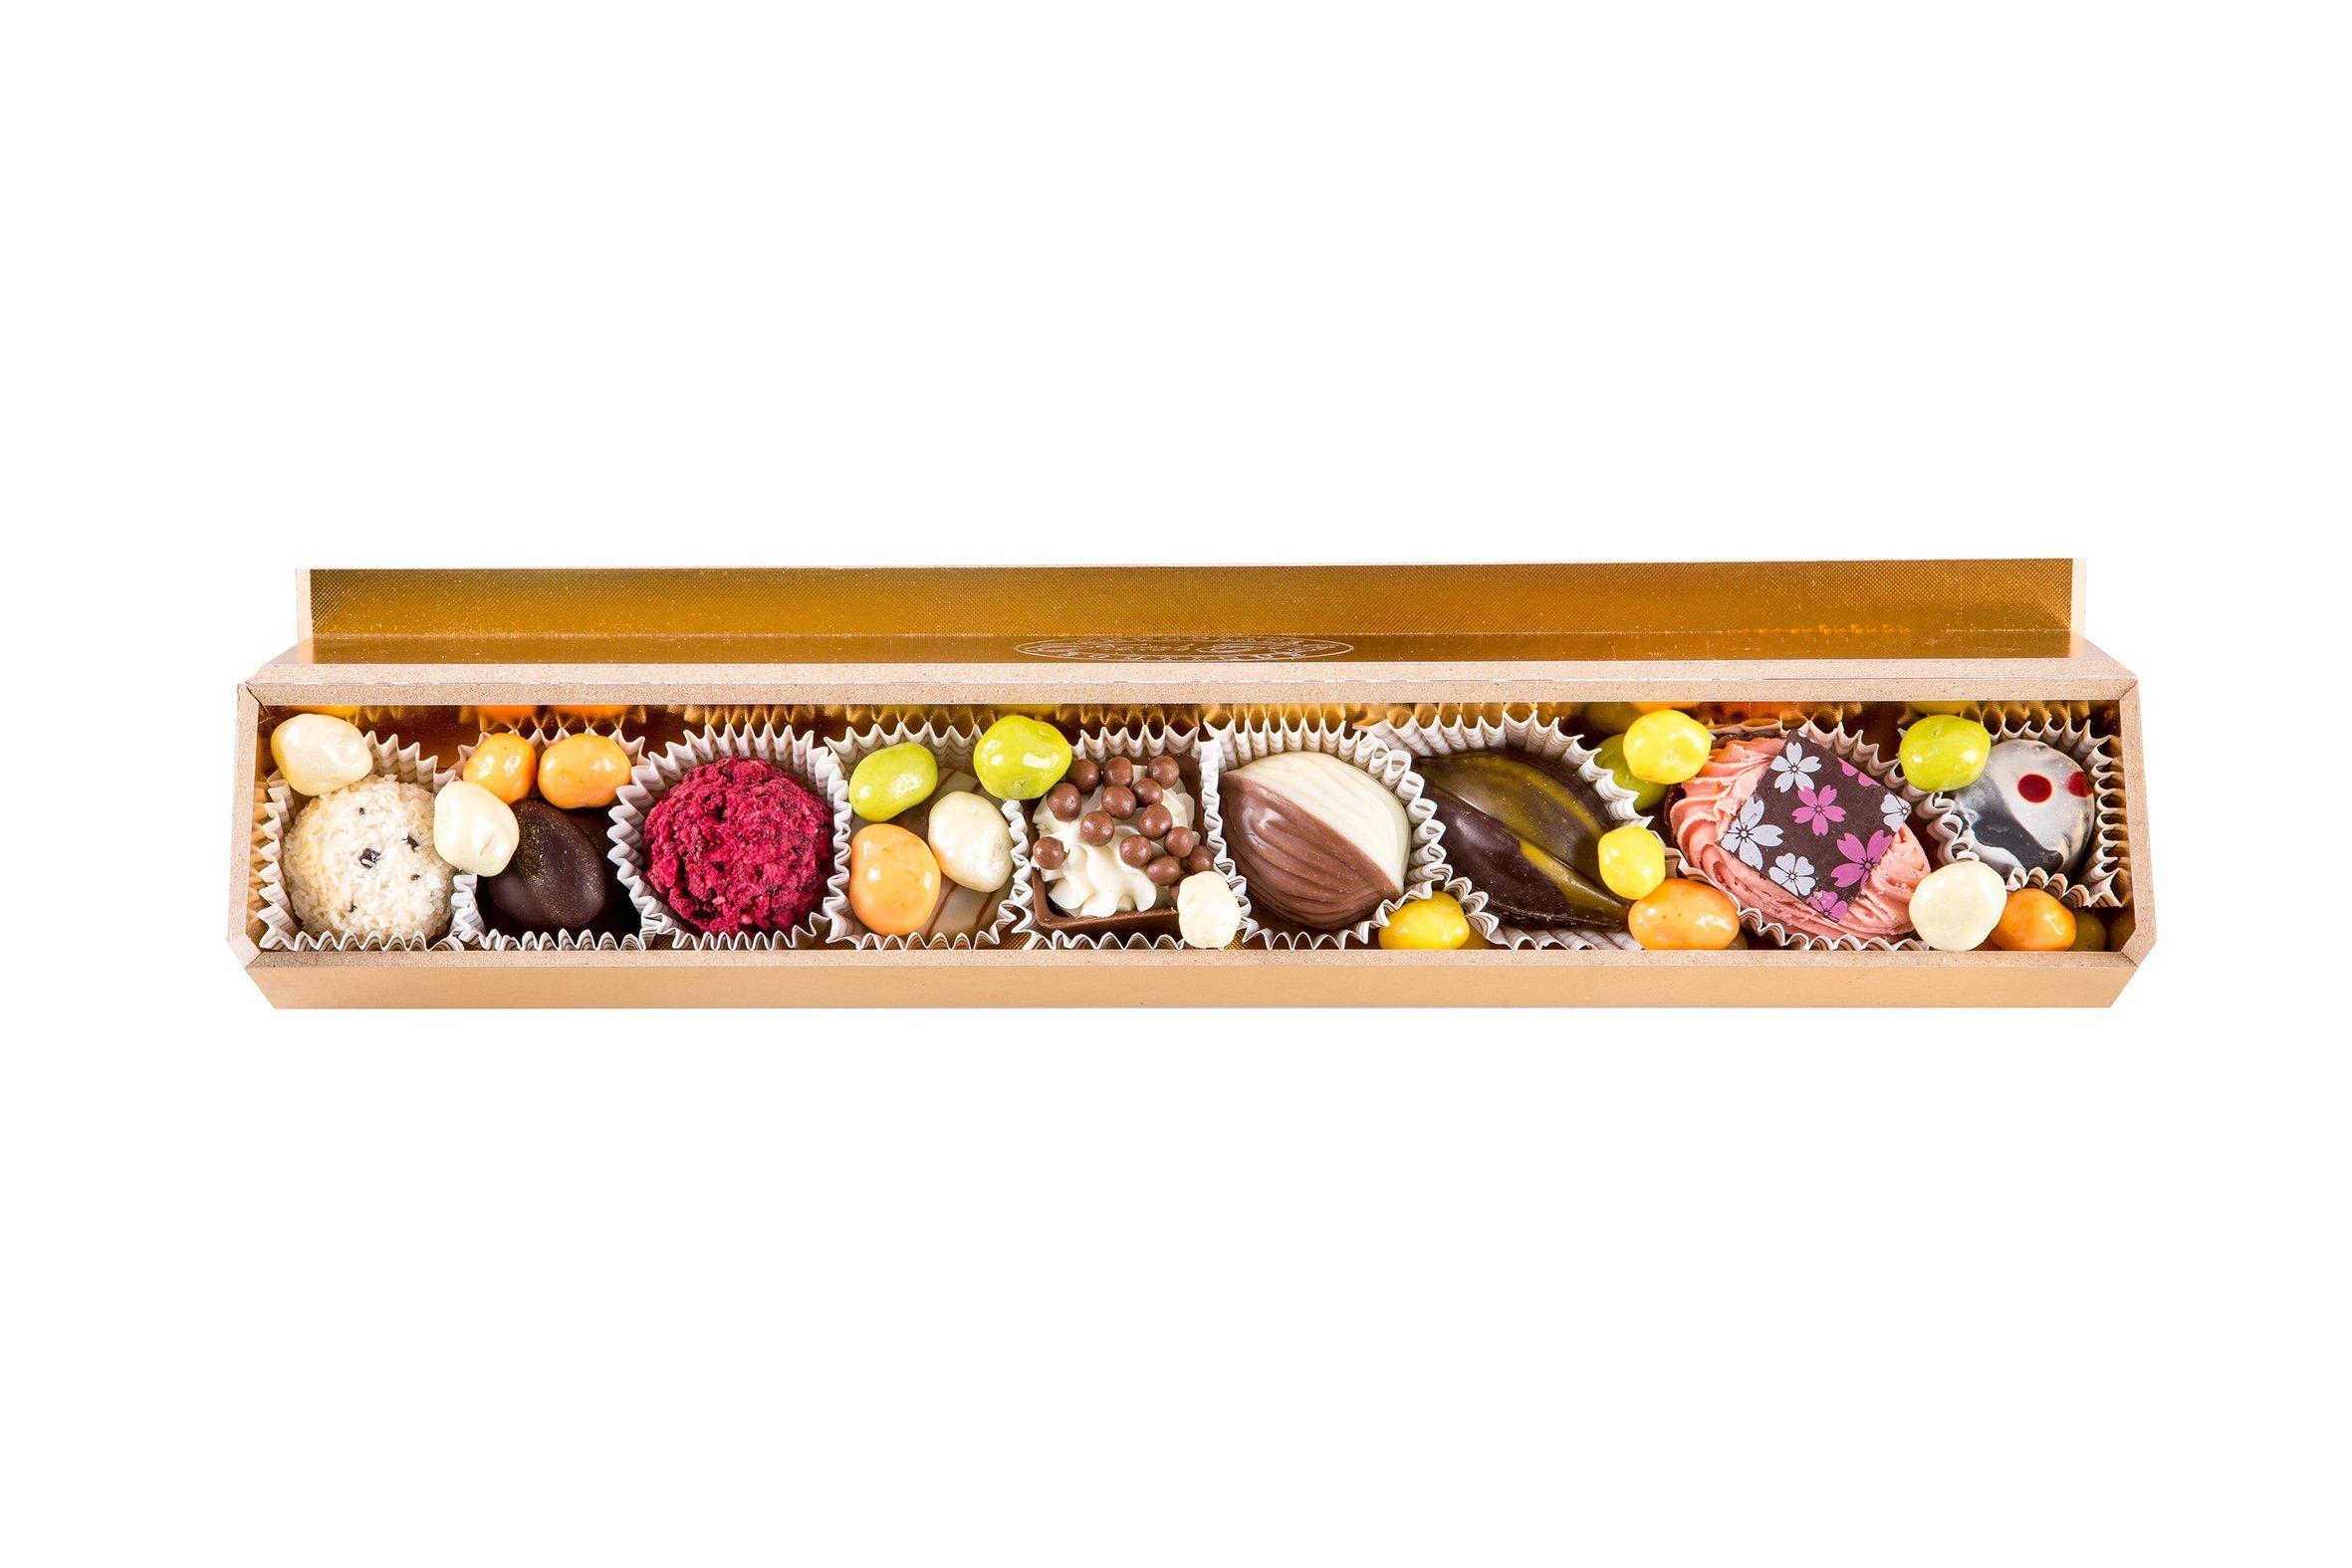 Шоколадный набор Жемчуг